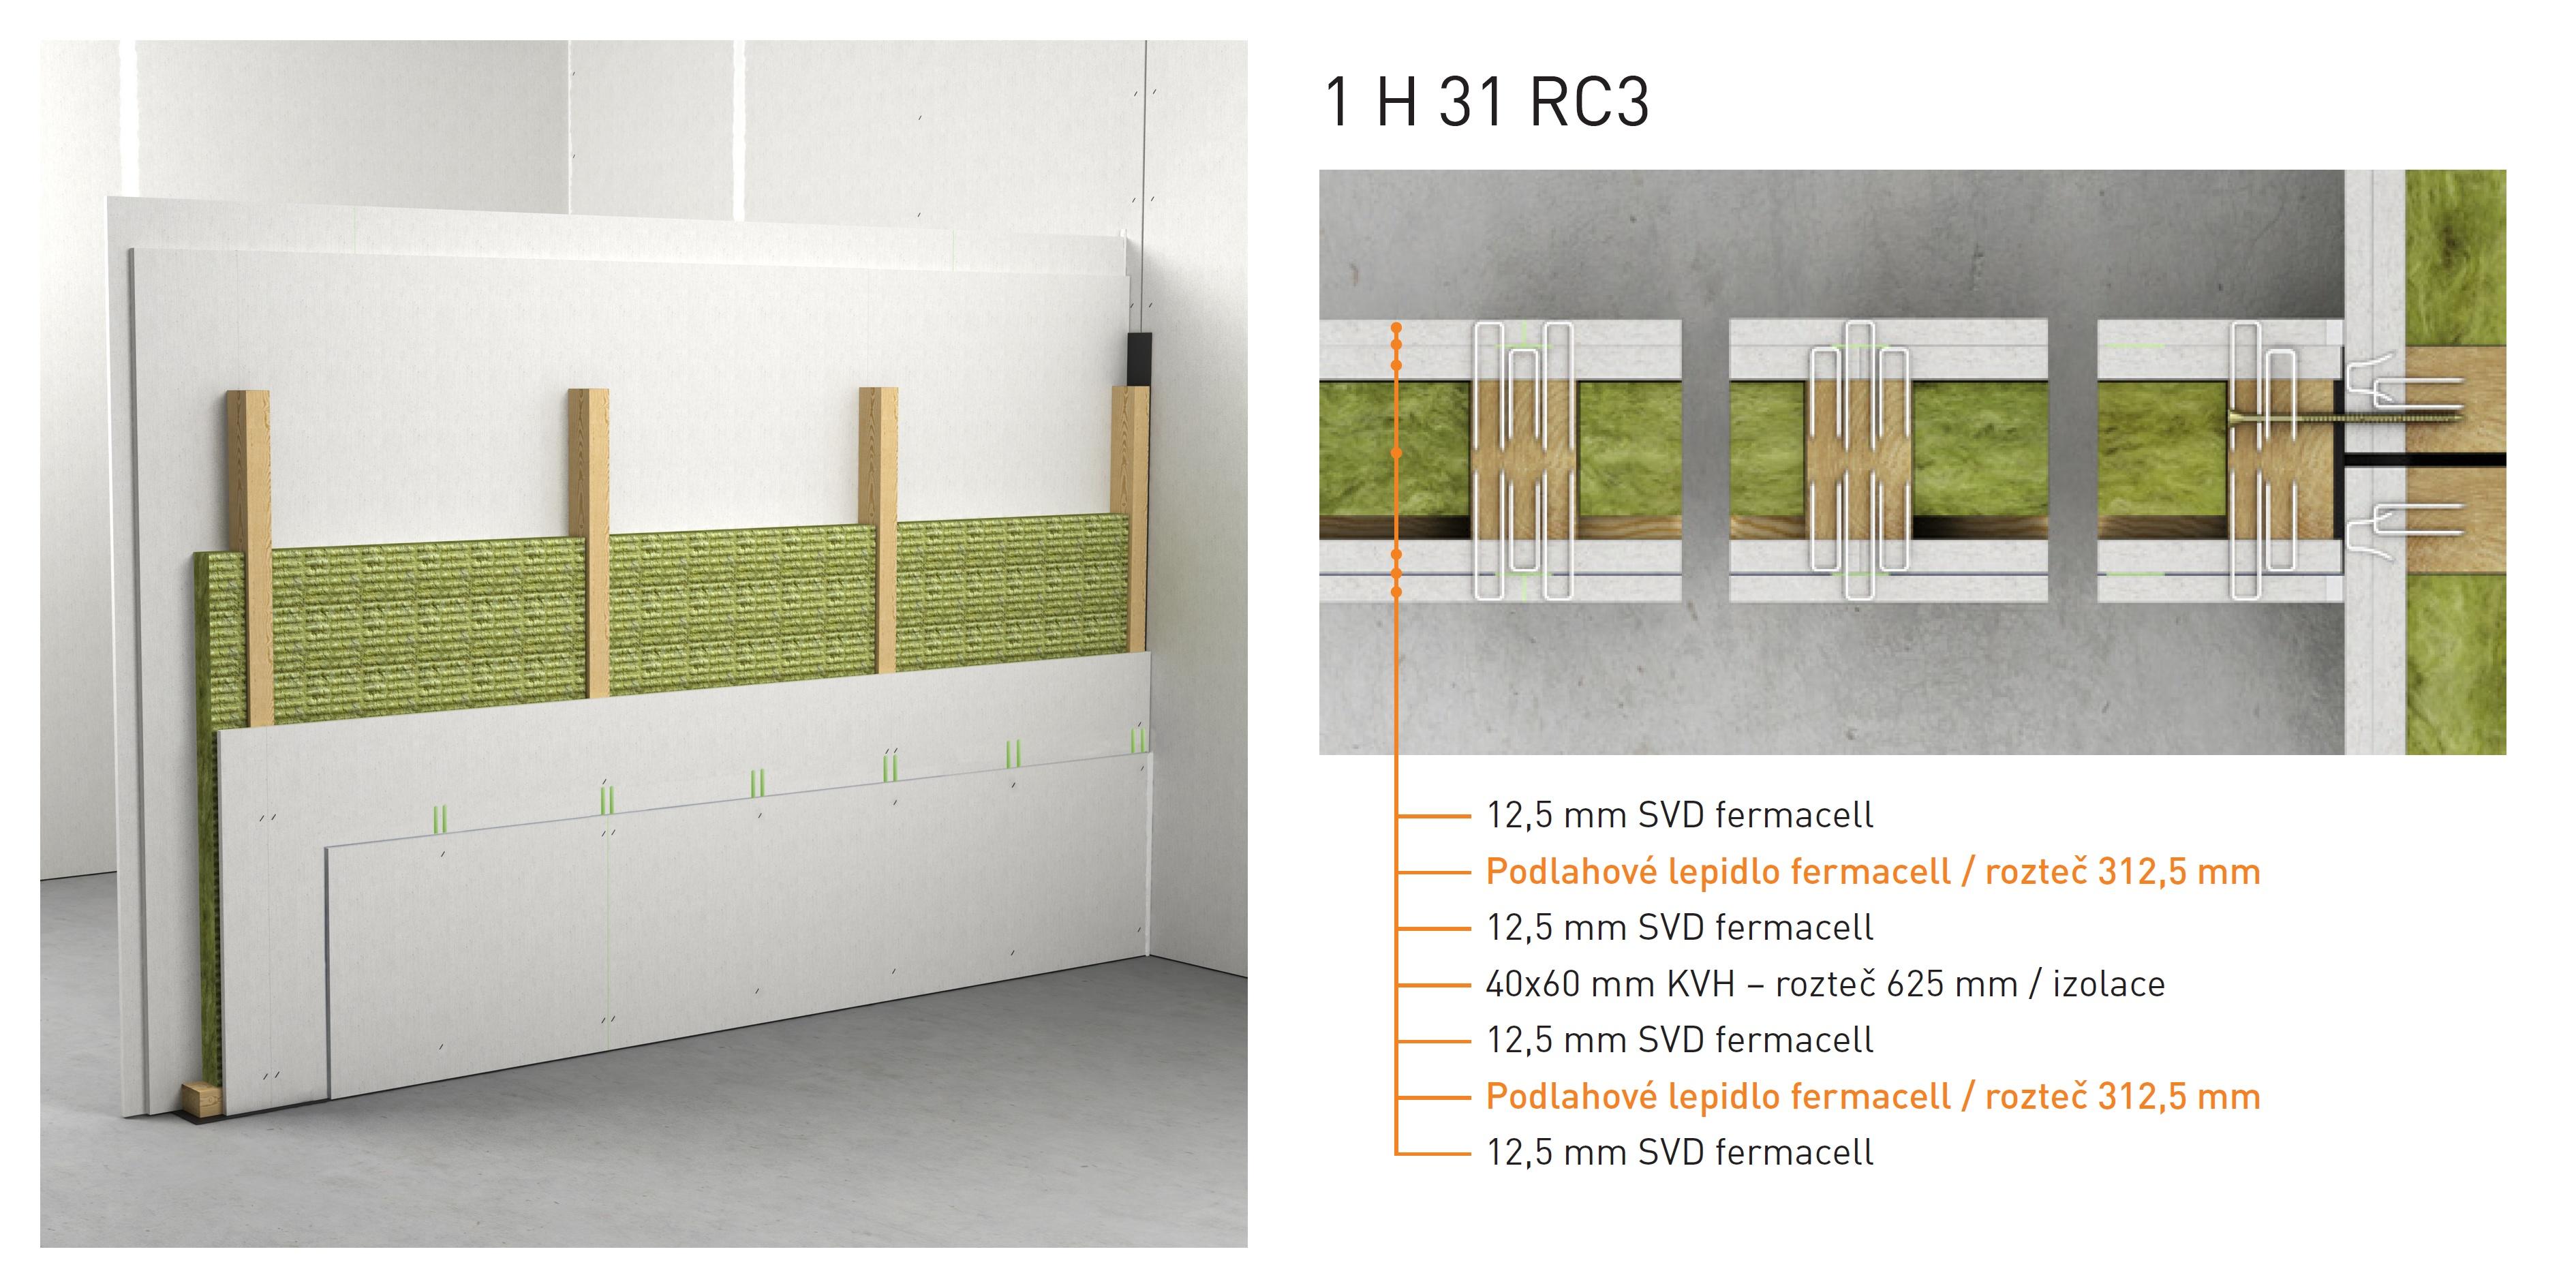 Skladba montované stěny Fermacell 1H31 RC3